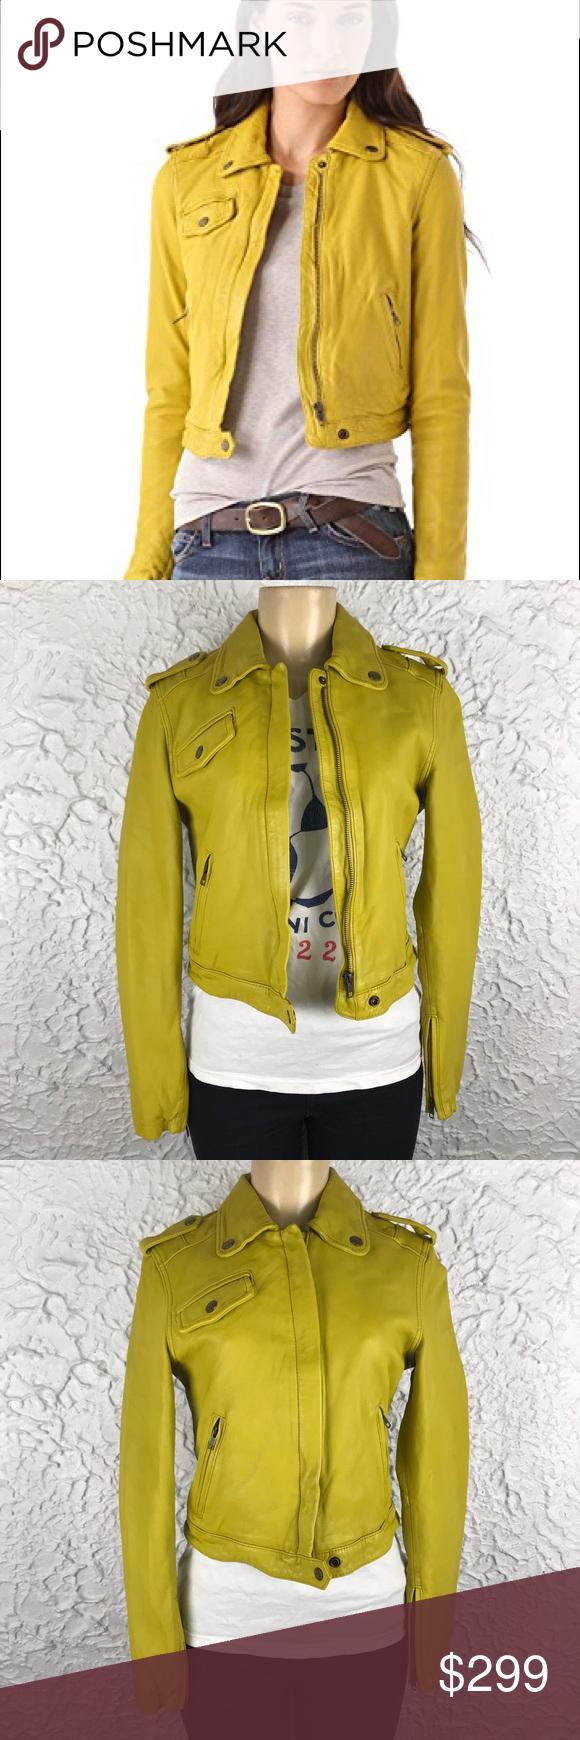 922de3d32162 New Current Elliott The Zip up moto jacket size 2 NWT